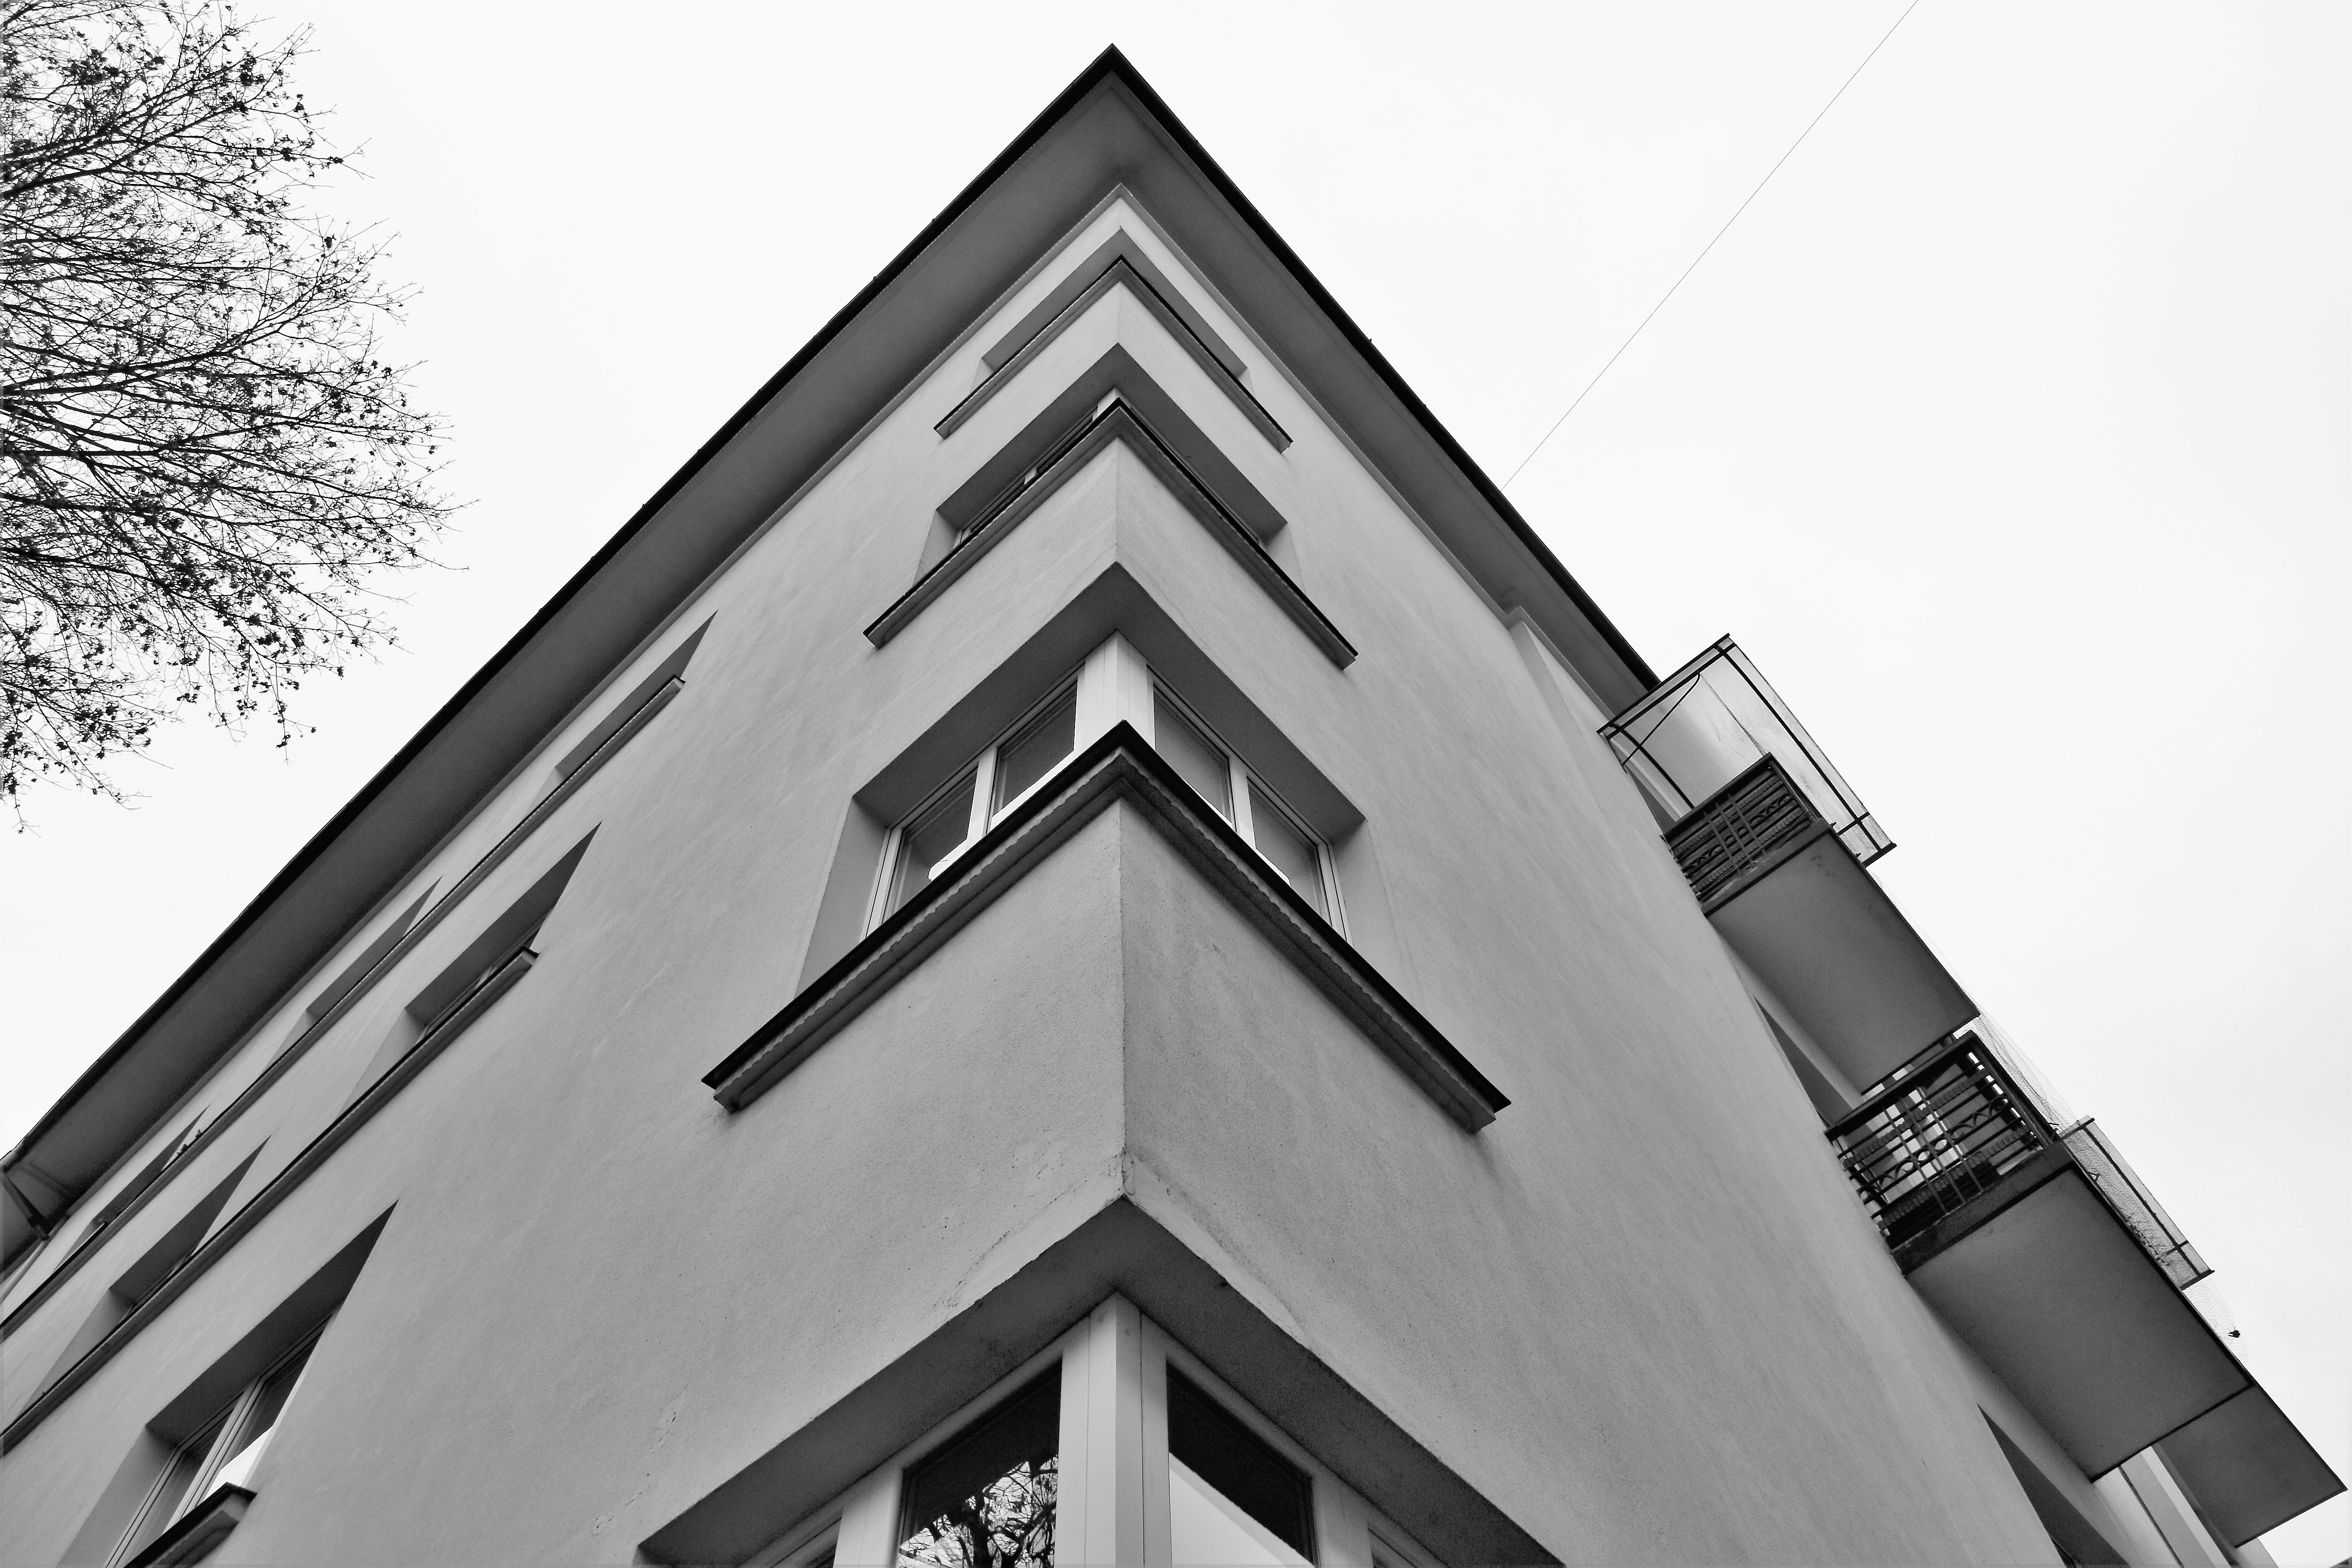 Krakow_Bujwida_002